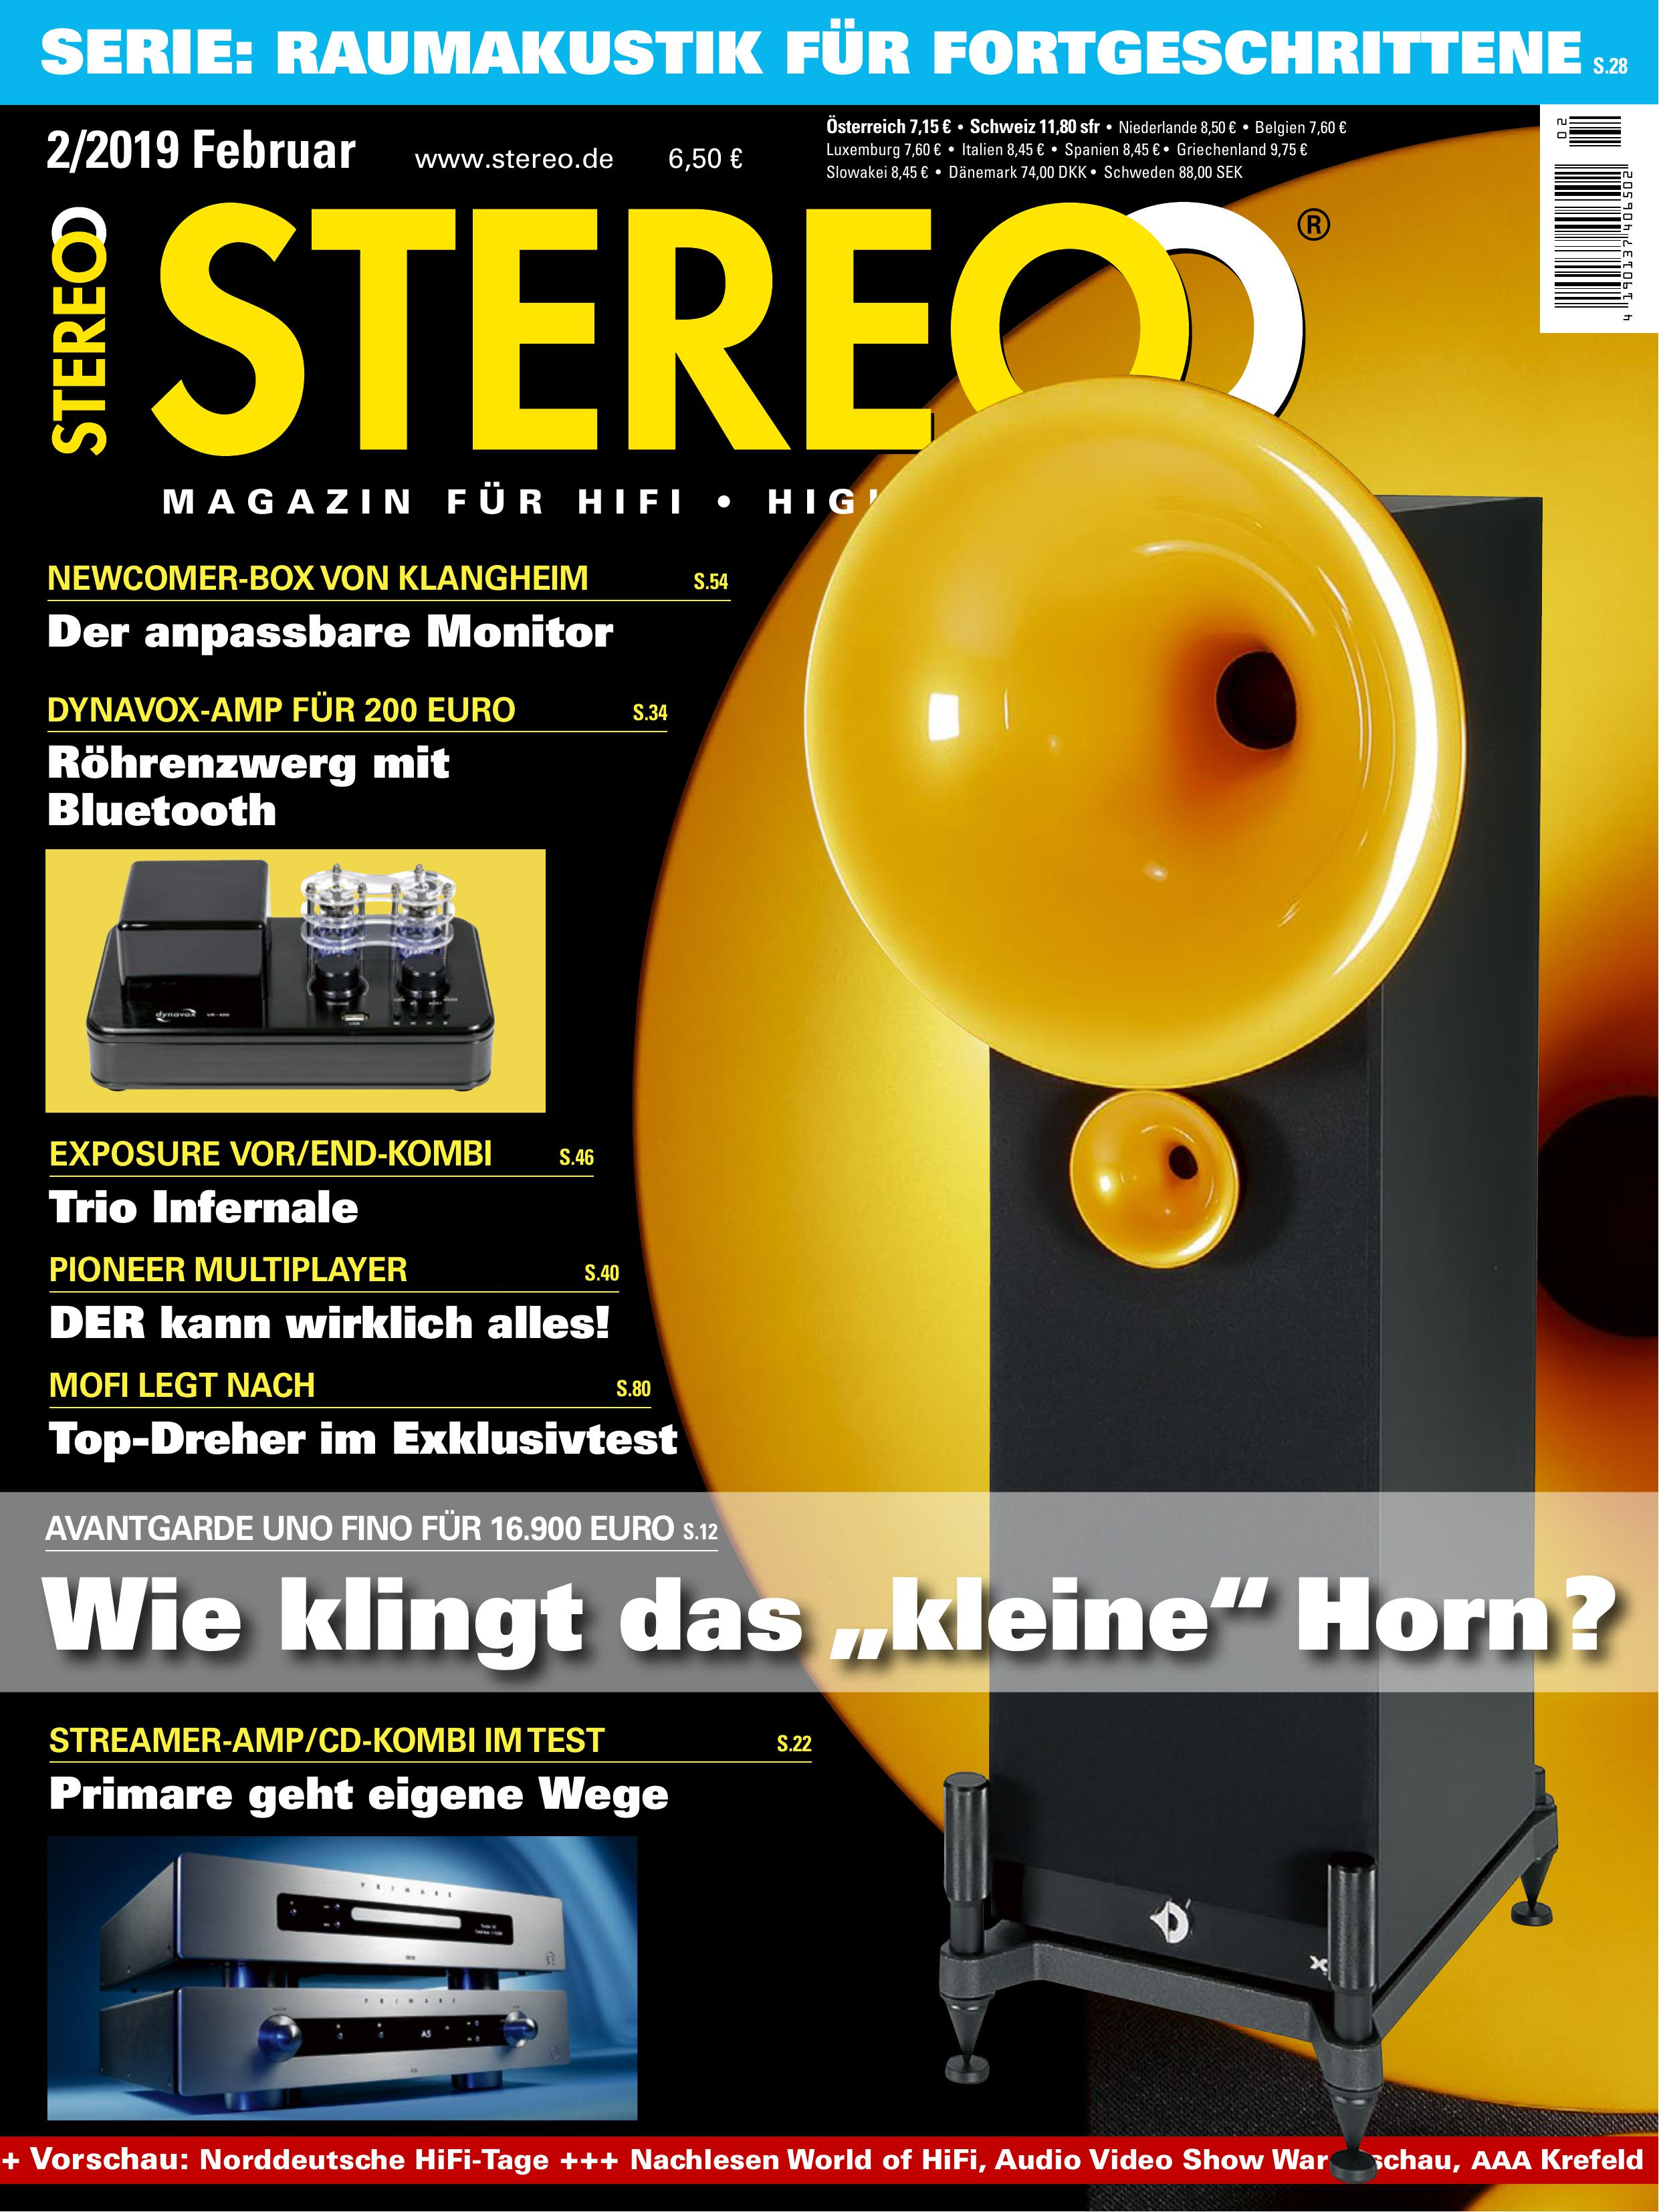 Stereo 2/2019 Raumakustik Auri Akustik Diffusor